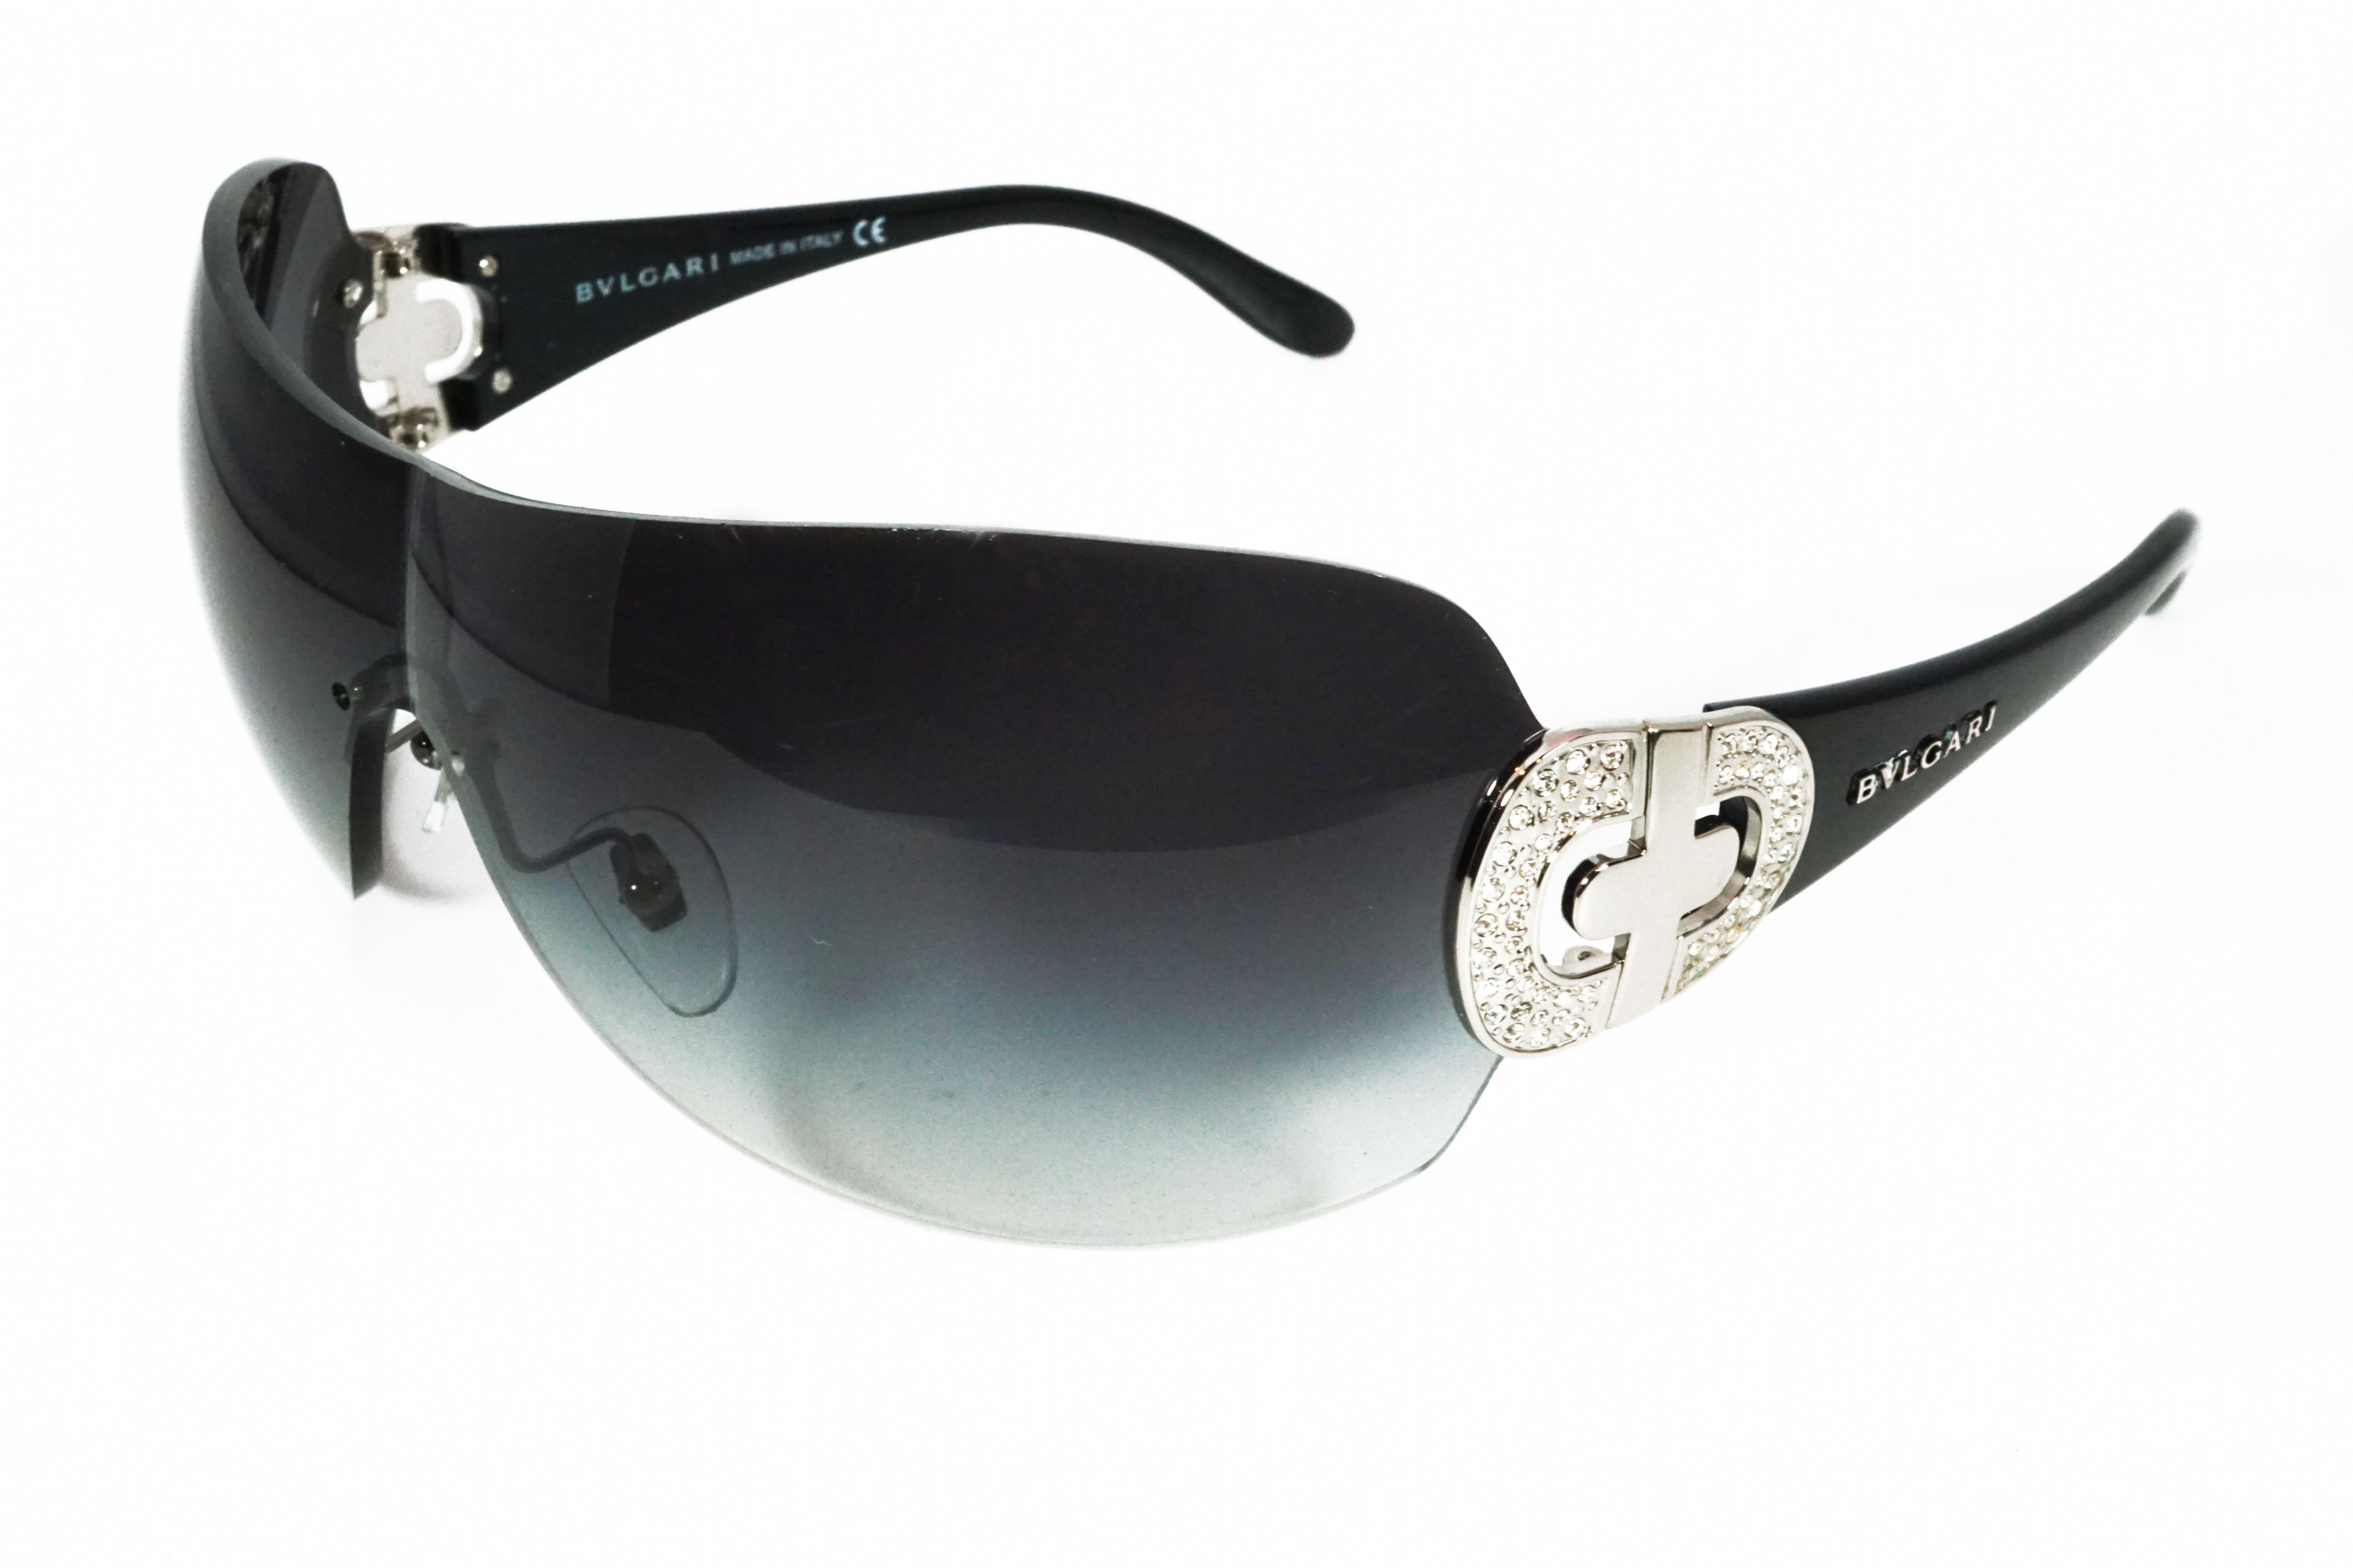 92999d4ac2a0 Bvlgari Sunglasses « Heritage Malta